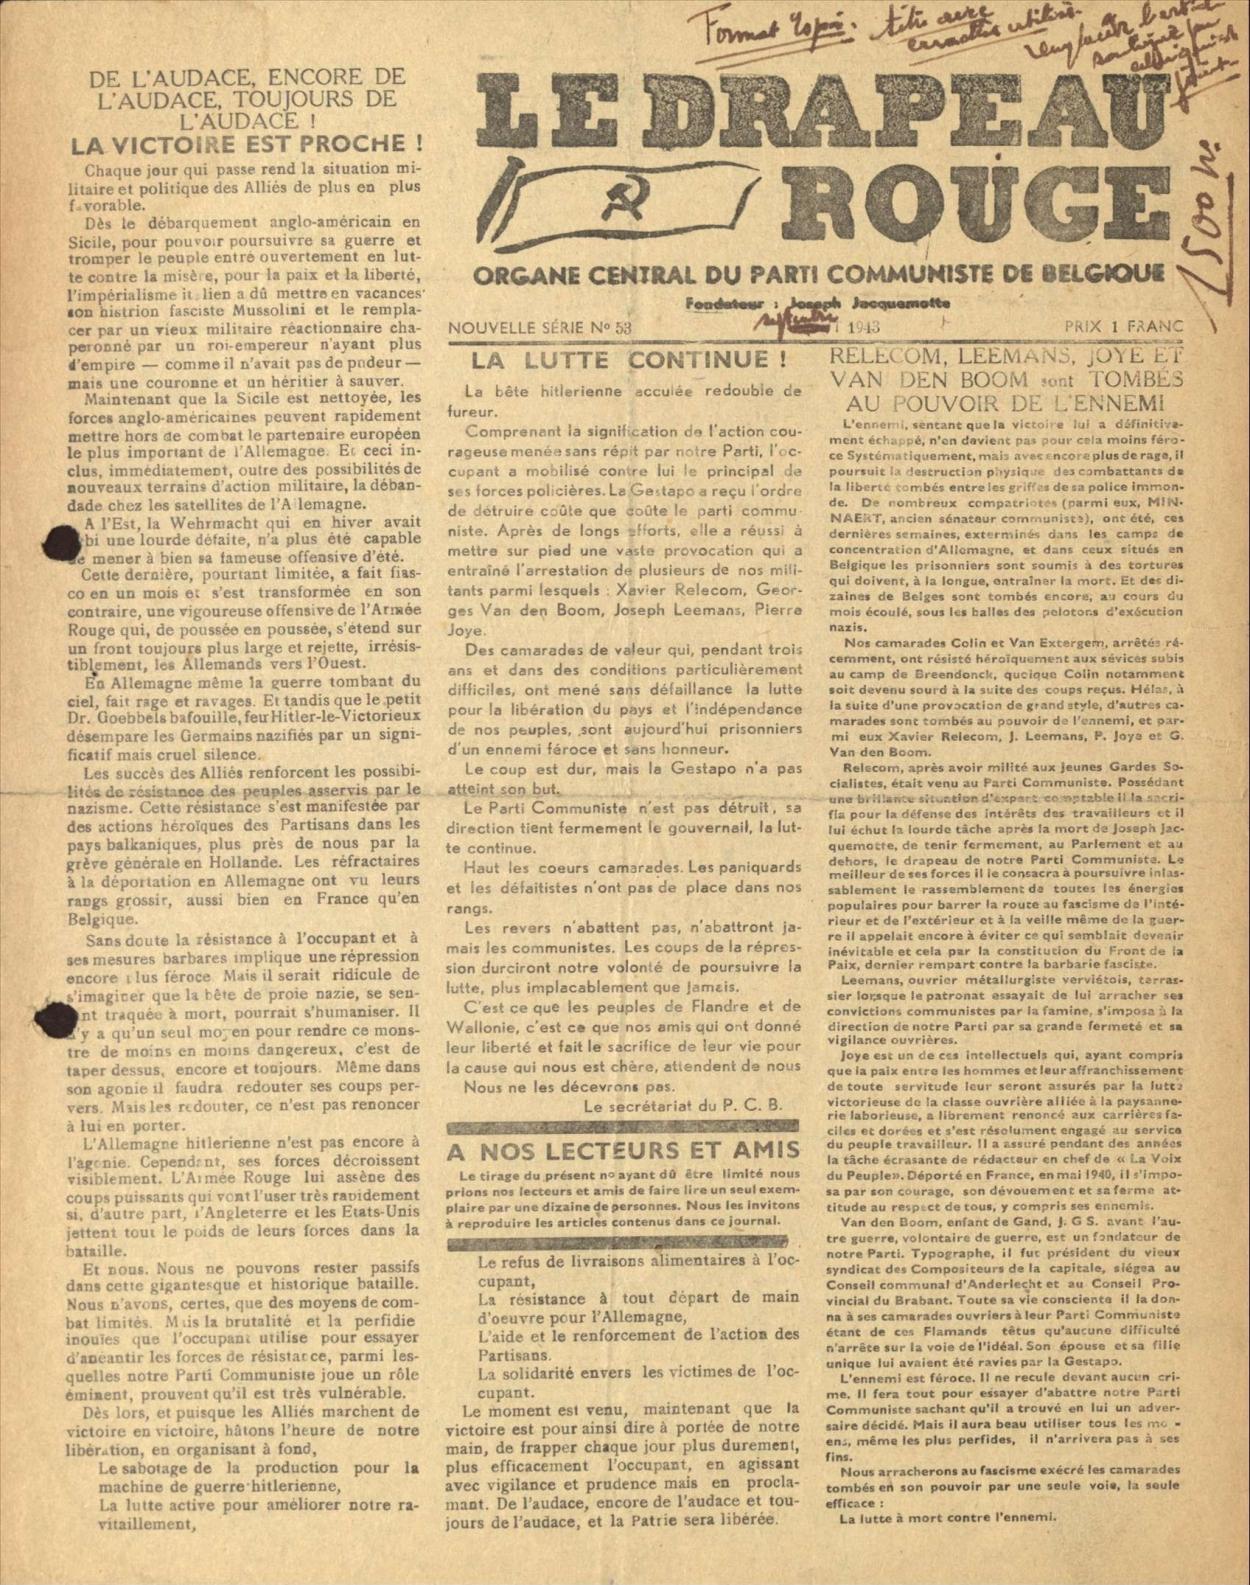 carcob_cl2-258_1943-08_01_056-00001-drapeau-rouge-aoAt-1943.jpg